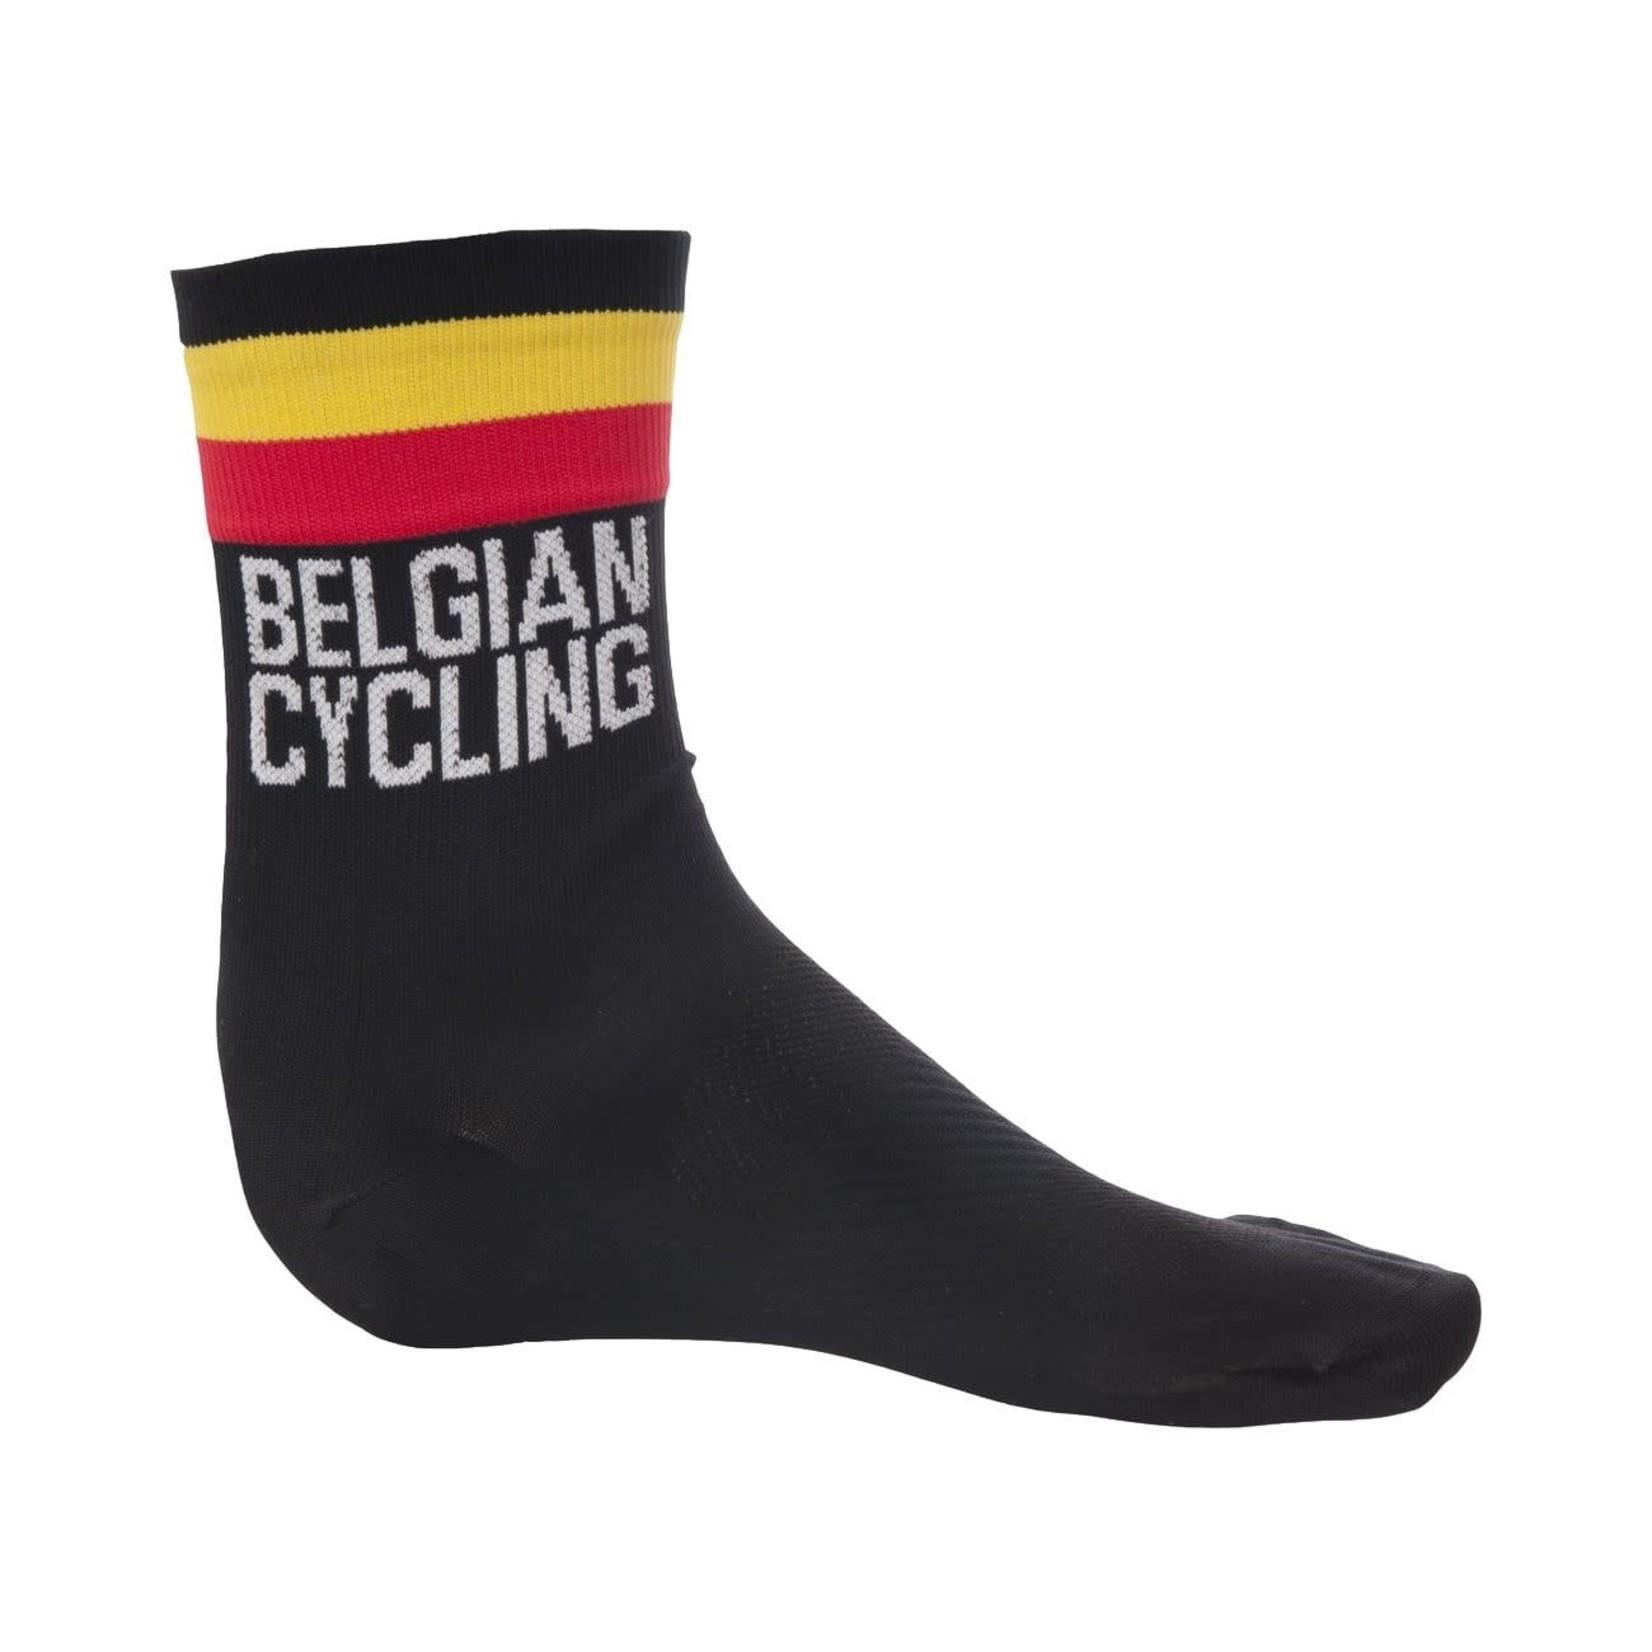 'Belgian Cycling' Team Sokken Zwart